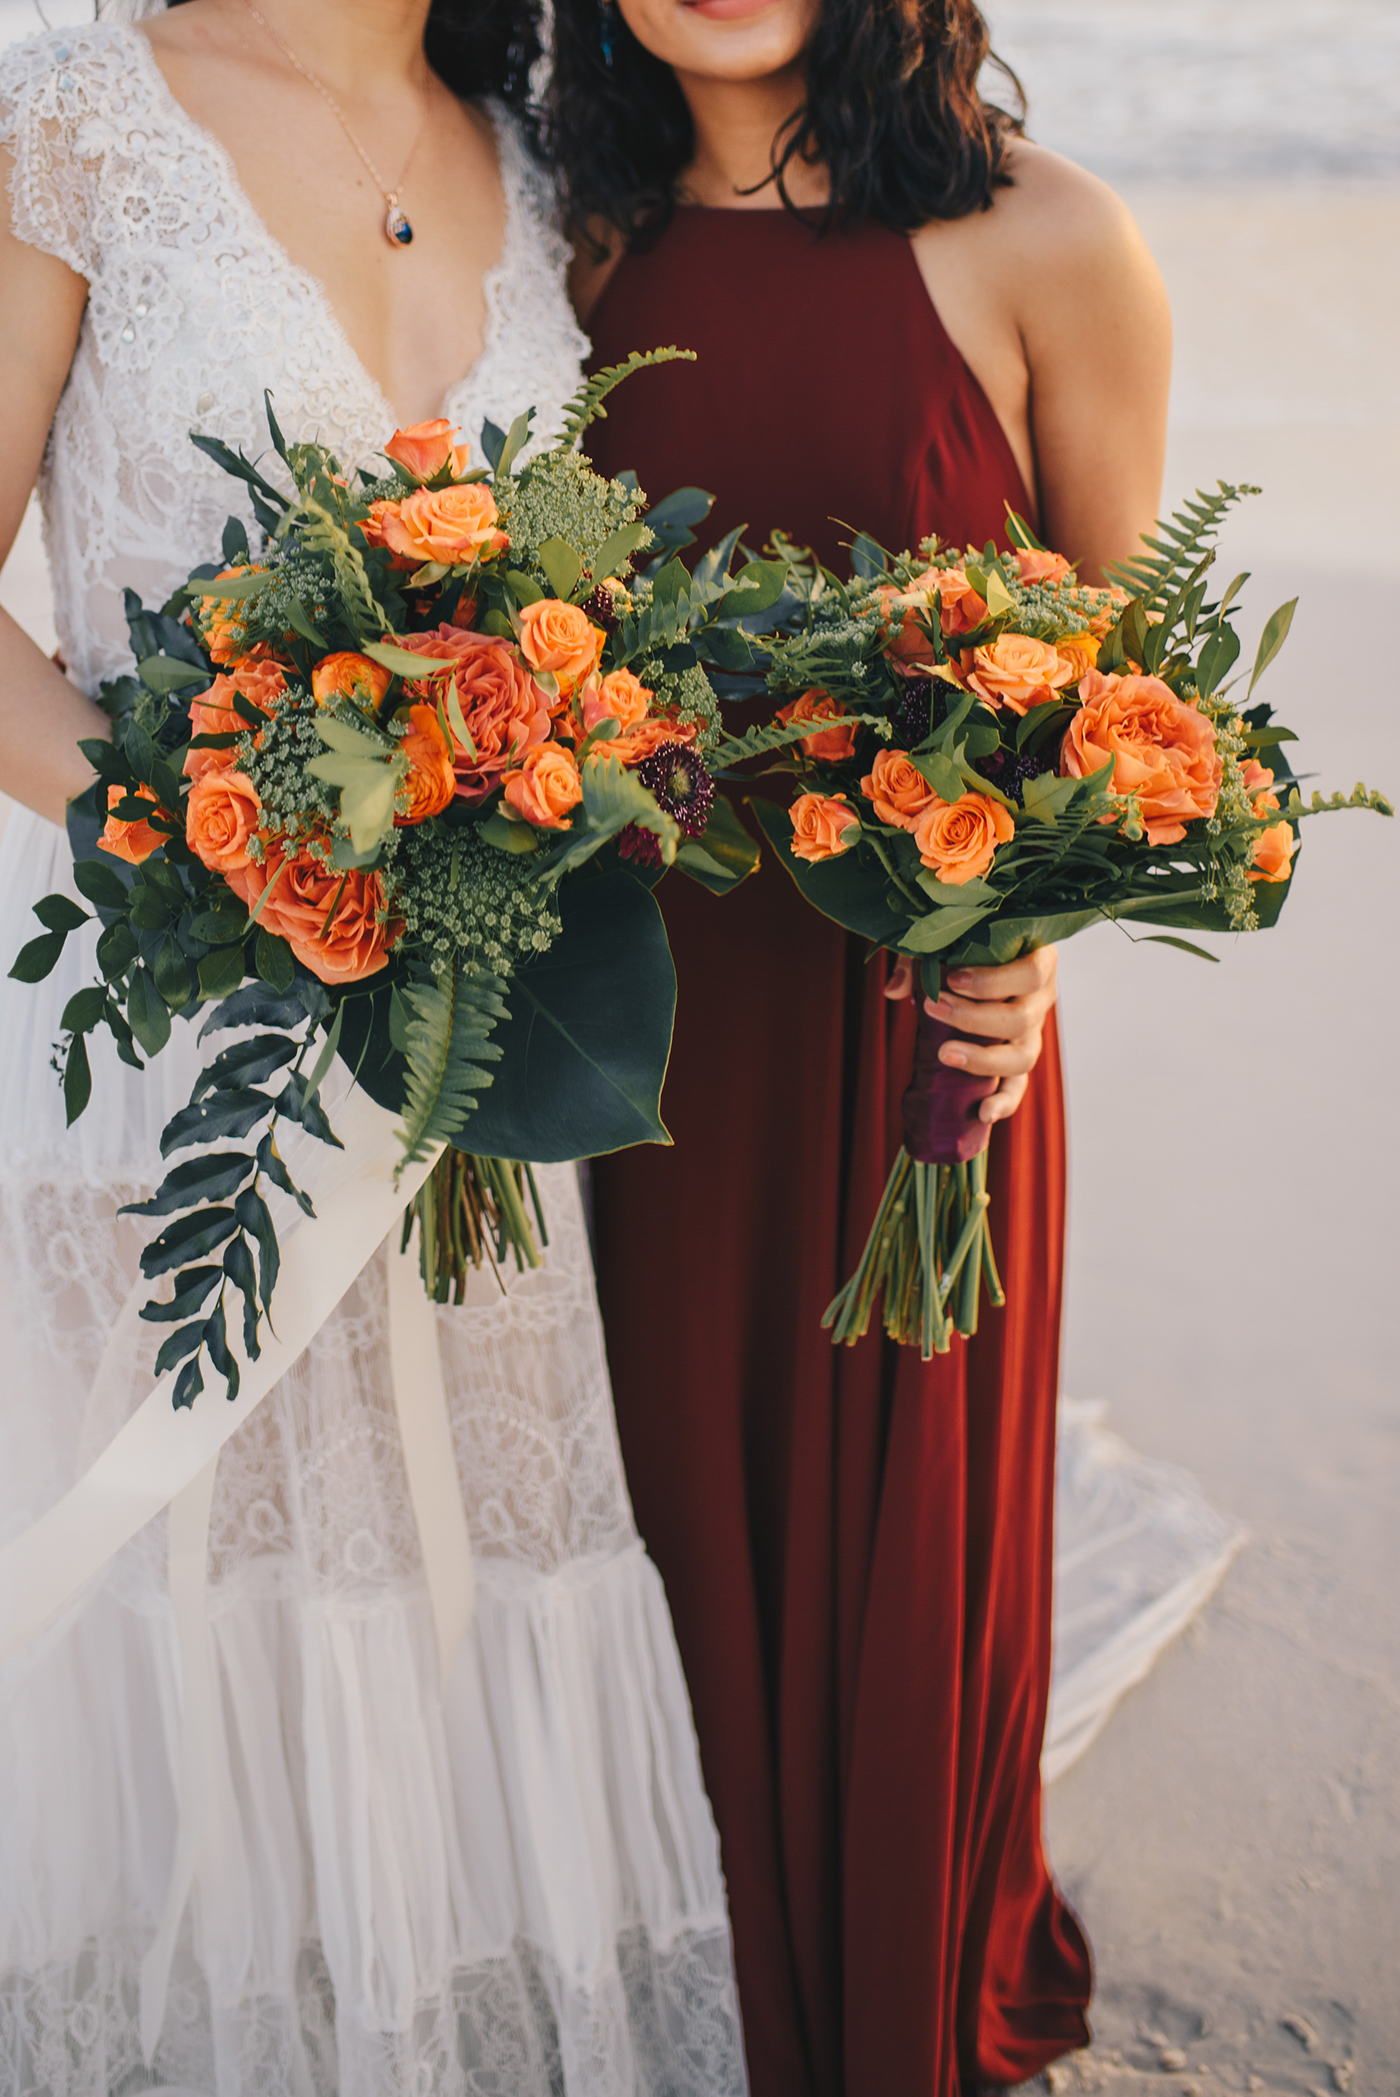 Los-Vargas-Photo-Moana-Wedding-Style-shoot-68.jpg